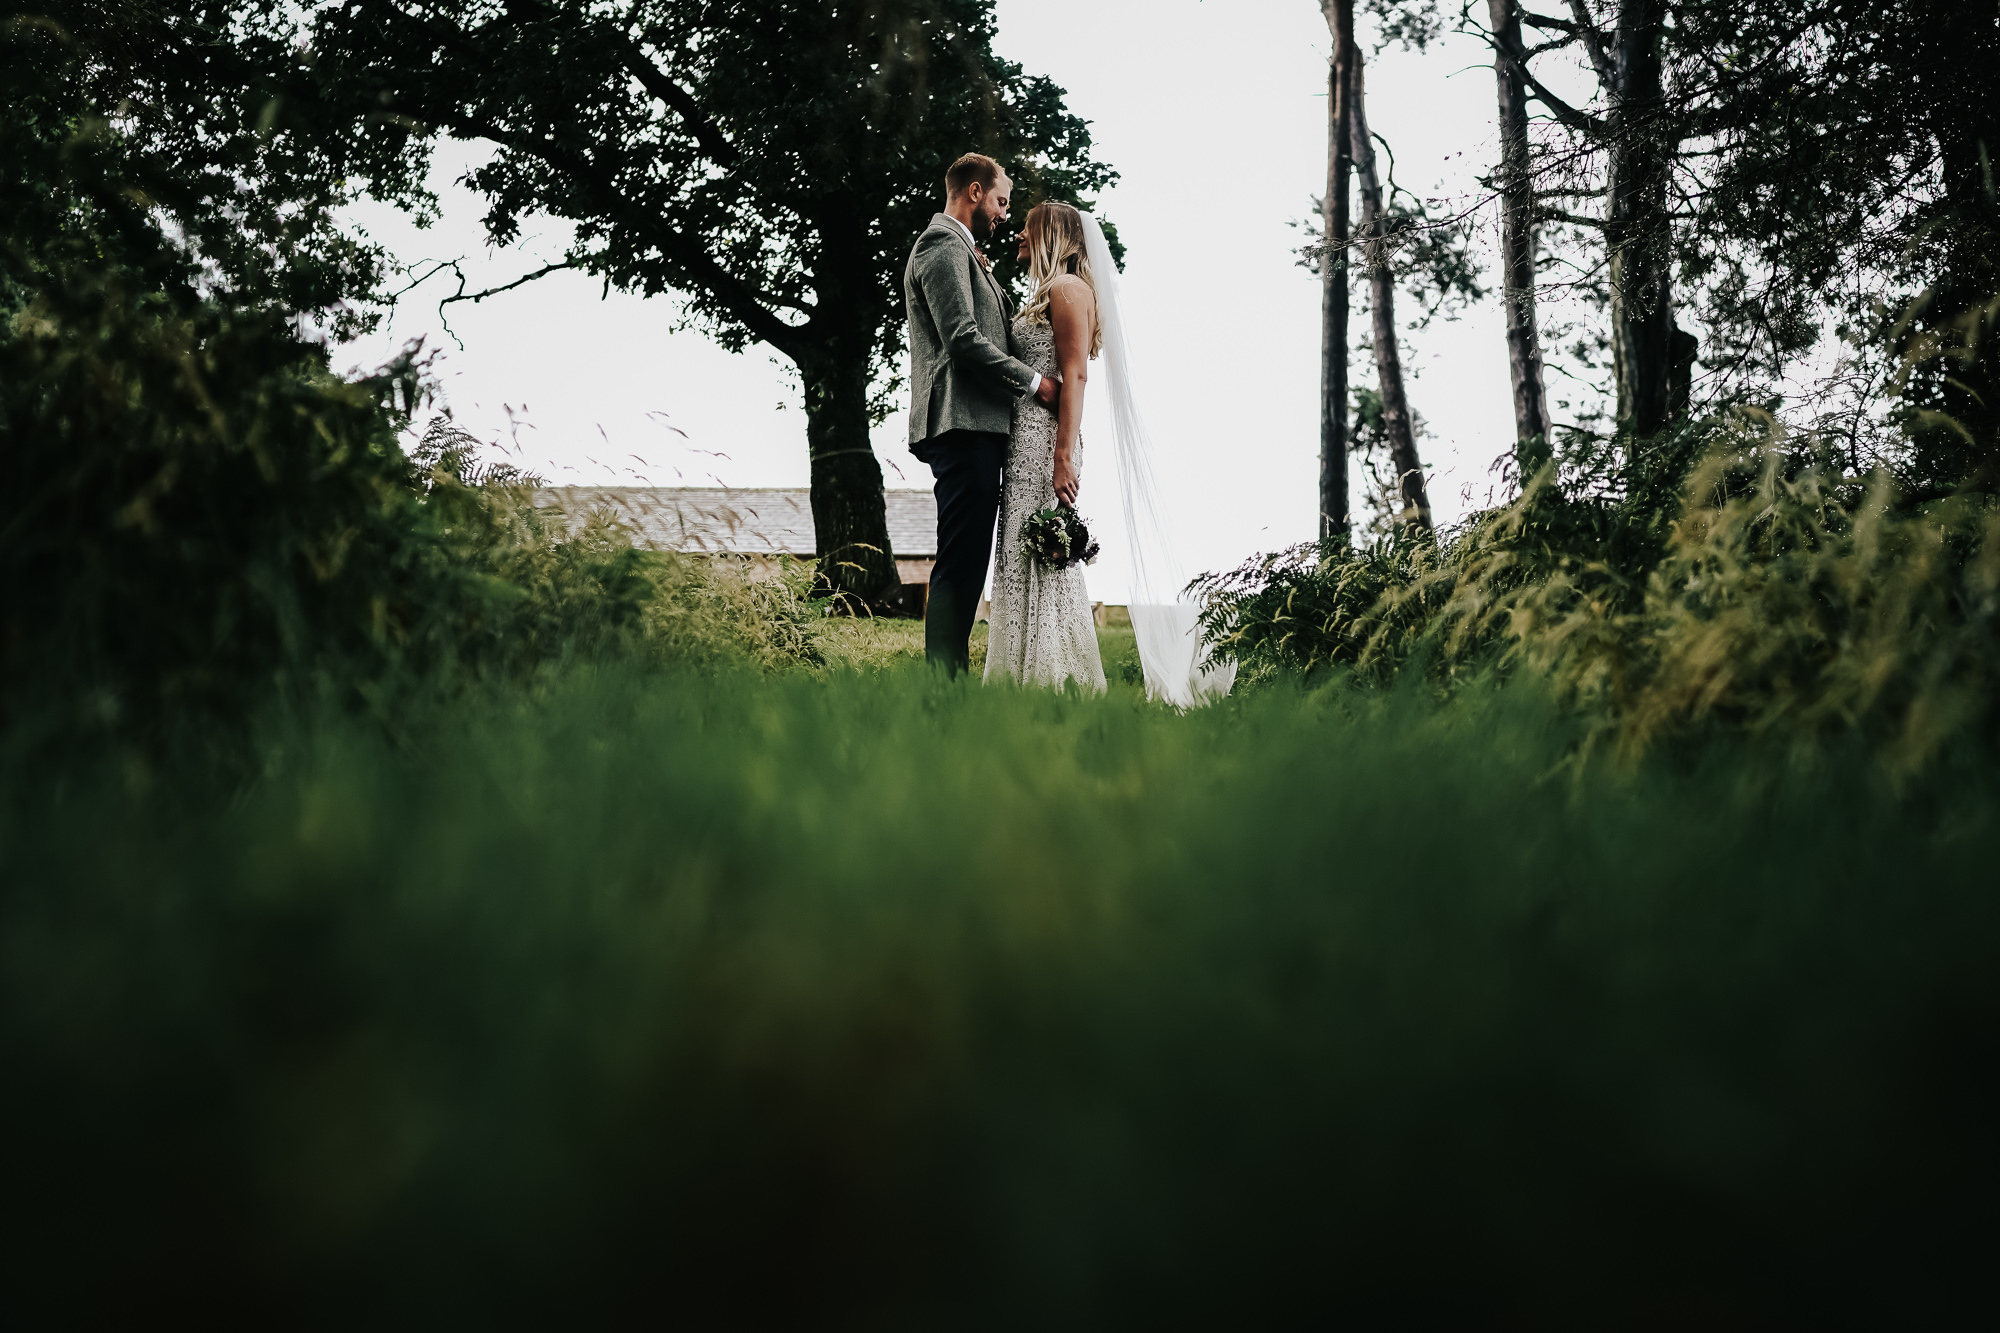 High Barn Wedding photographer lake distect penrith documentry wedding photography (35 of 57).jpg